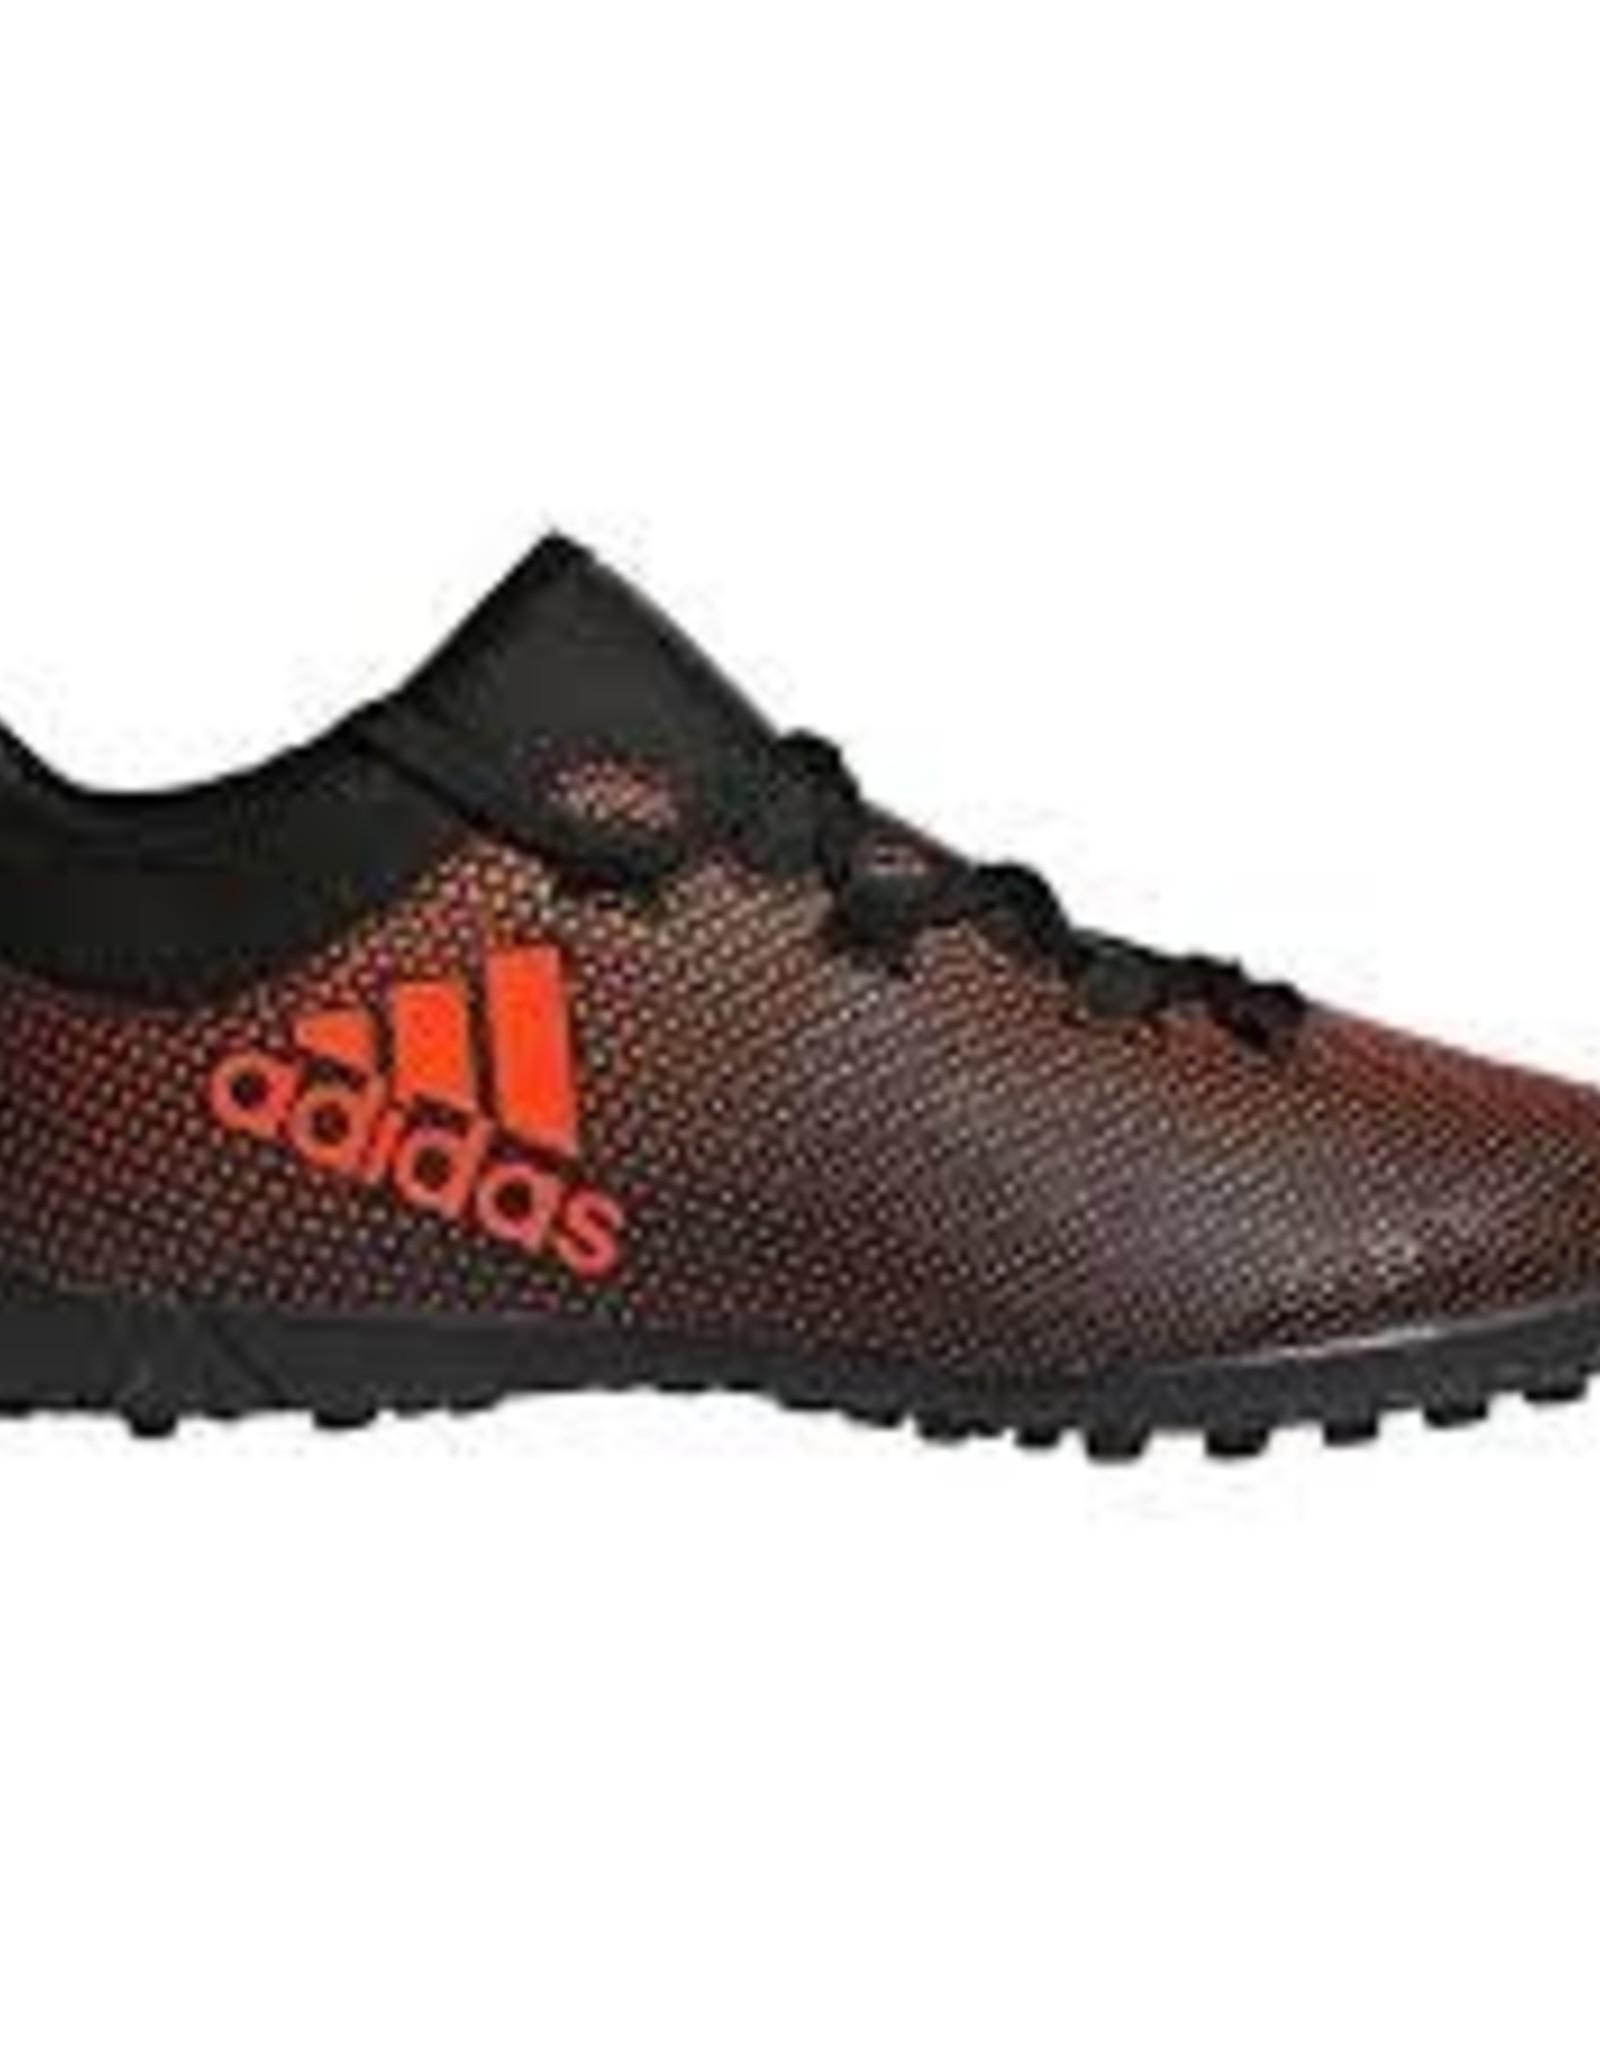 Adidas X 18.3 tango turf